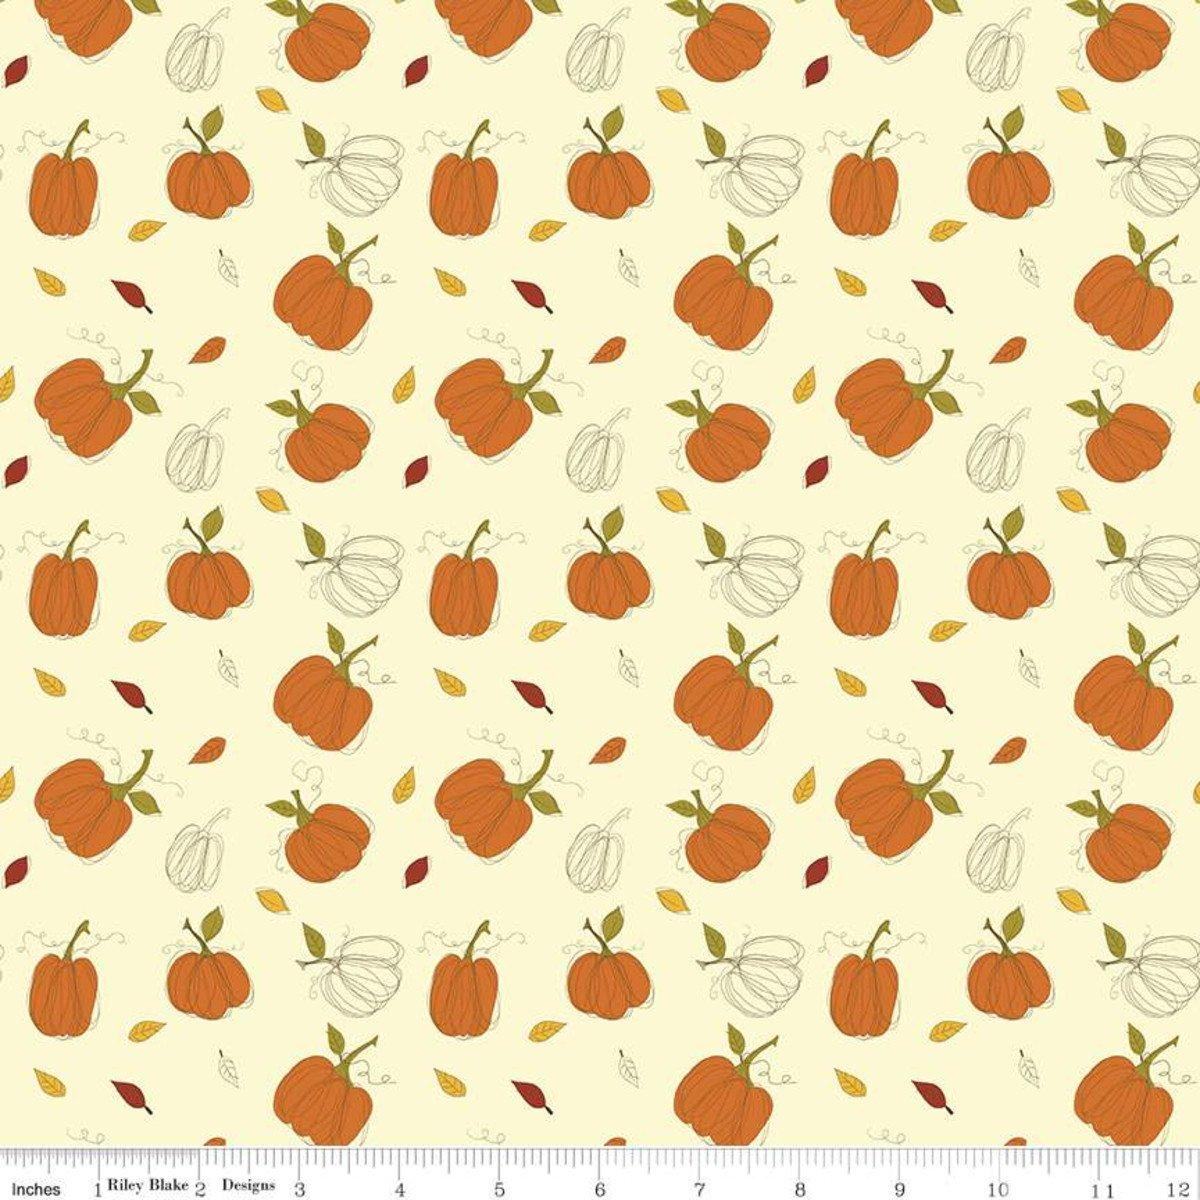 Riley Blake Adel In Autumn Pumpkins C10821 Cream